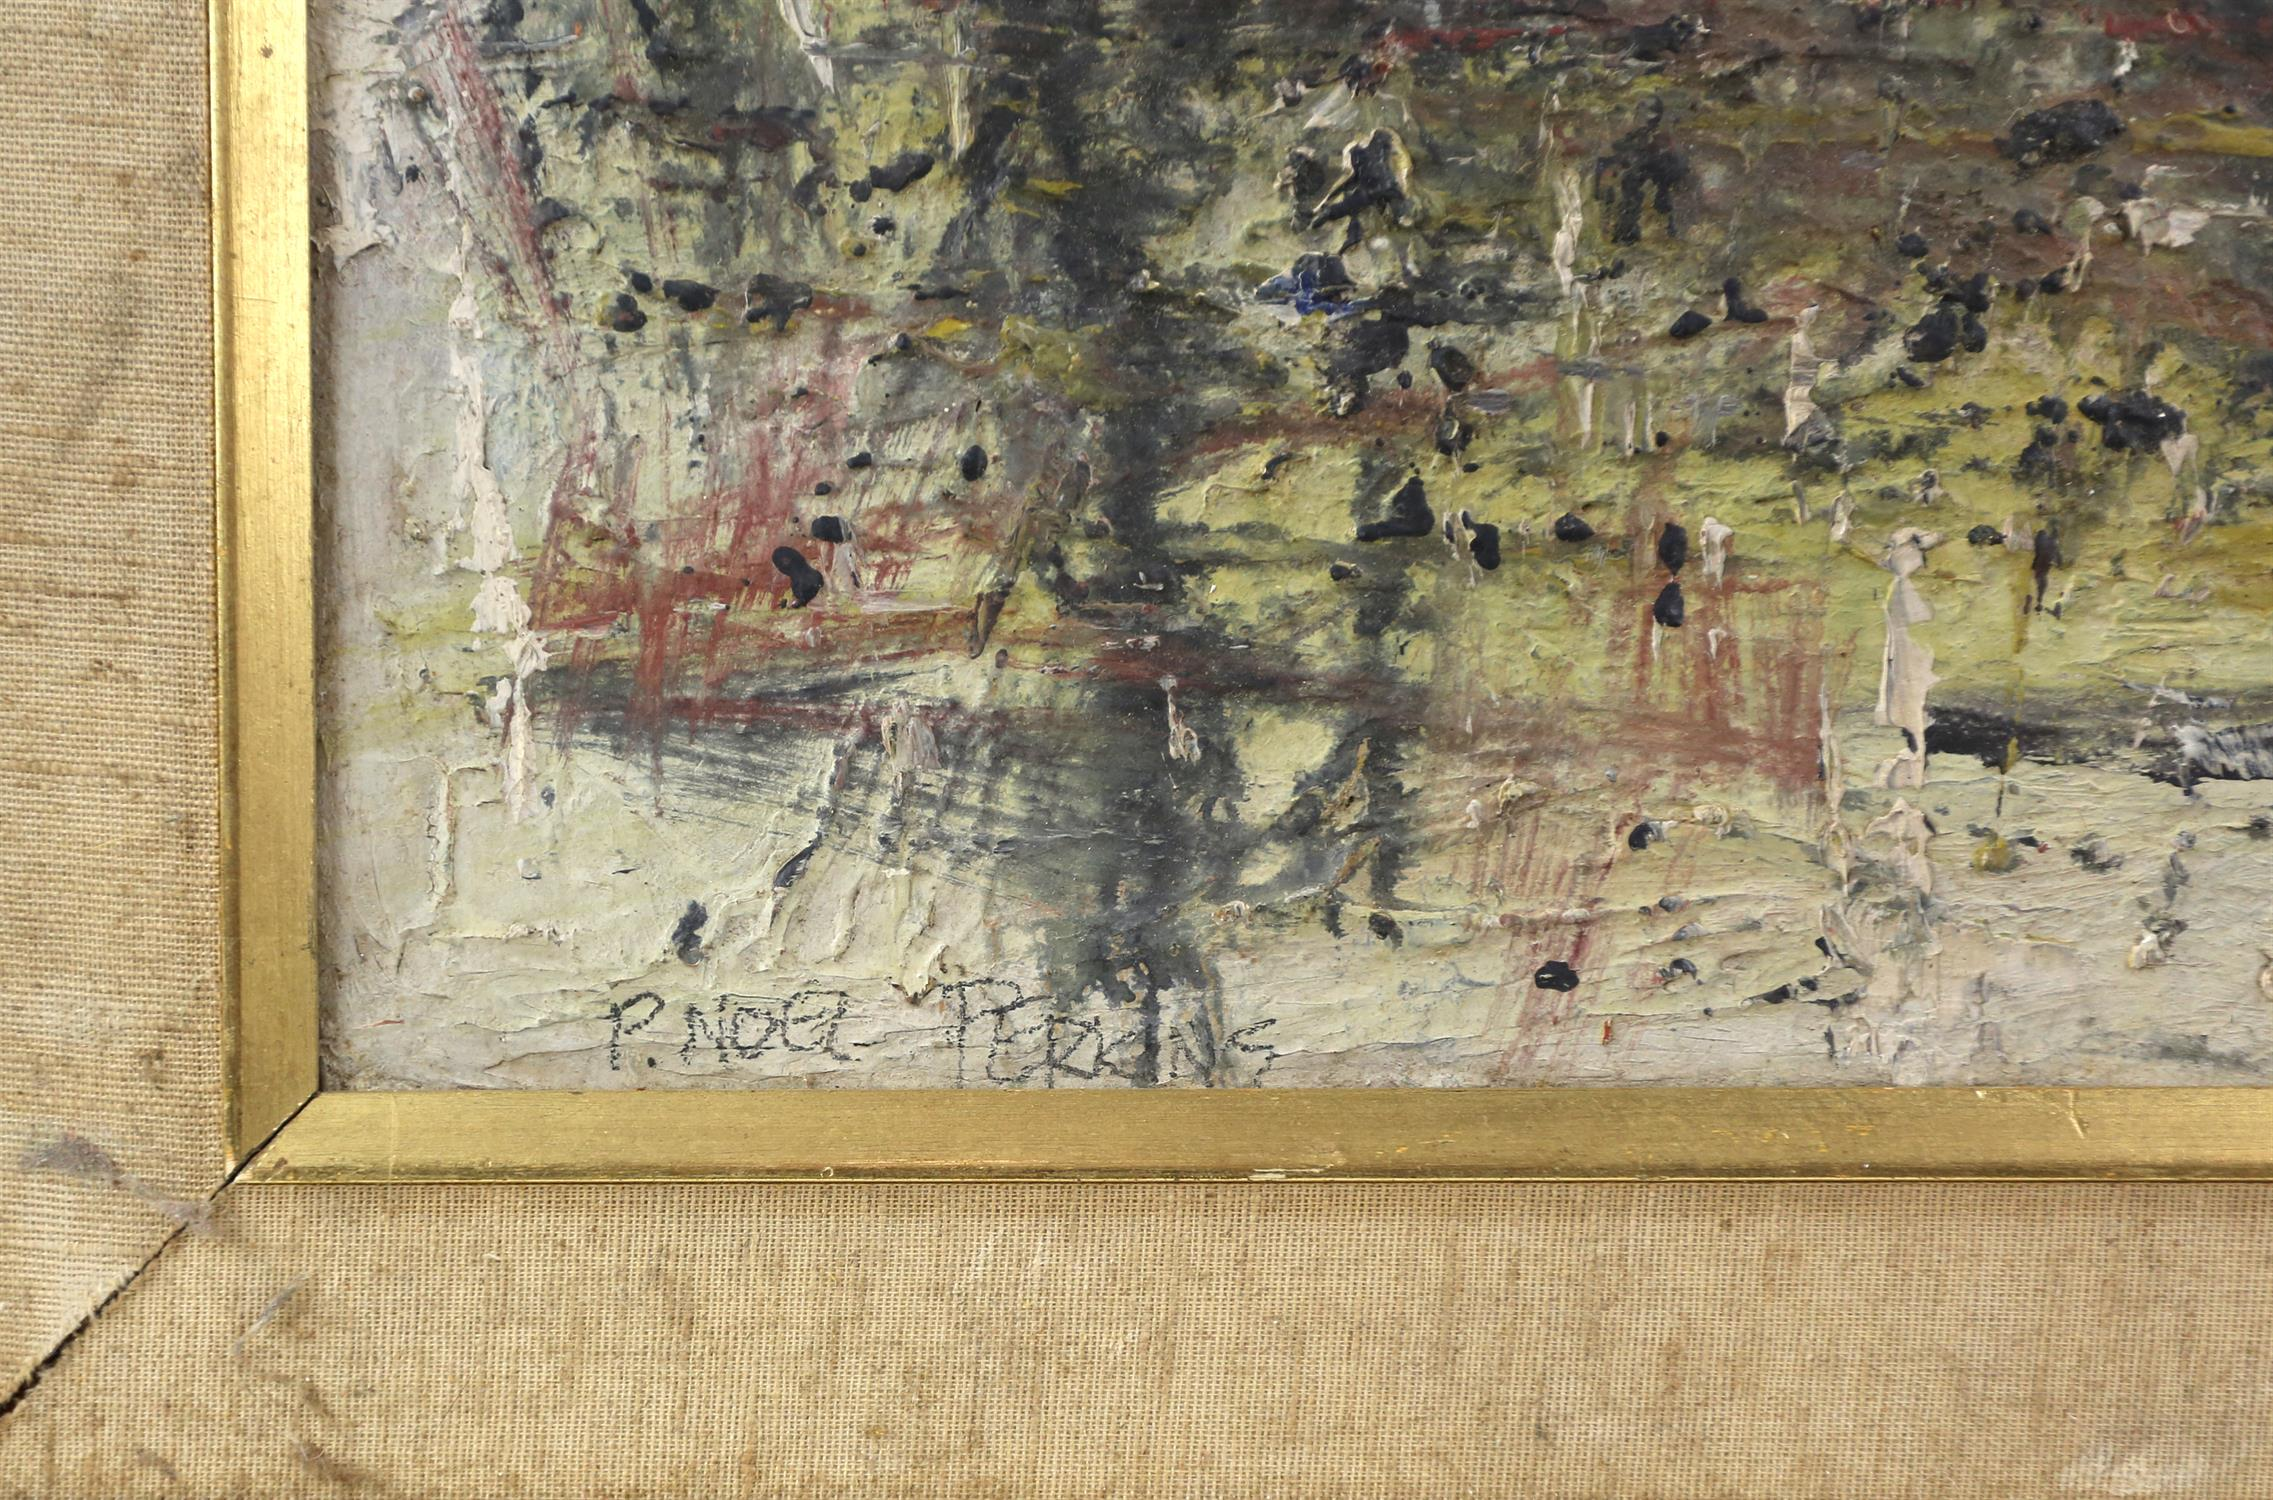 Peter Noel Perkins, abstract landscape. Oil on board. Signed lower left. Framed. Image size 33 x - Image 4 of 7